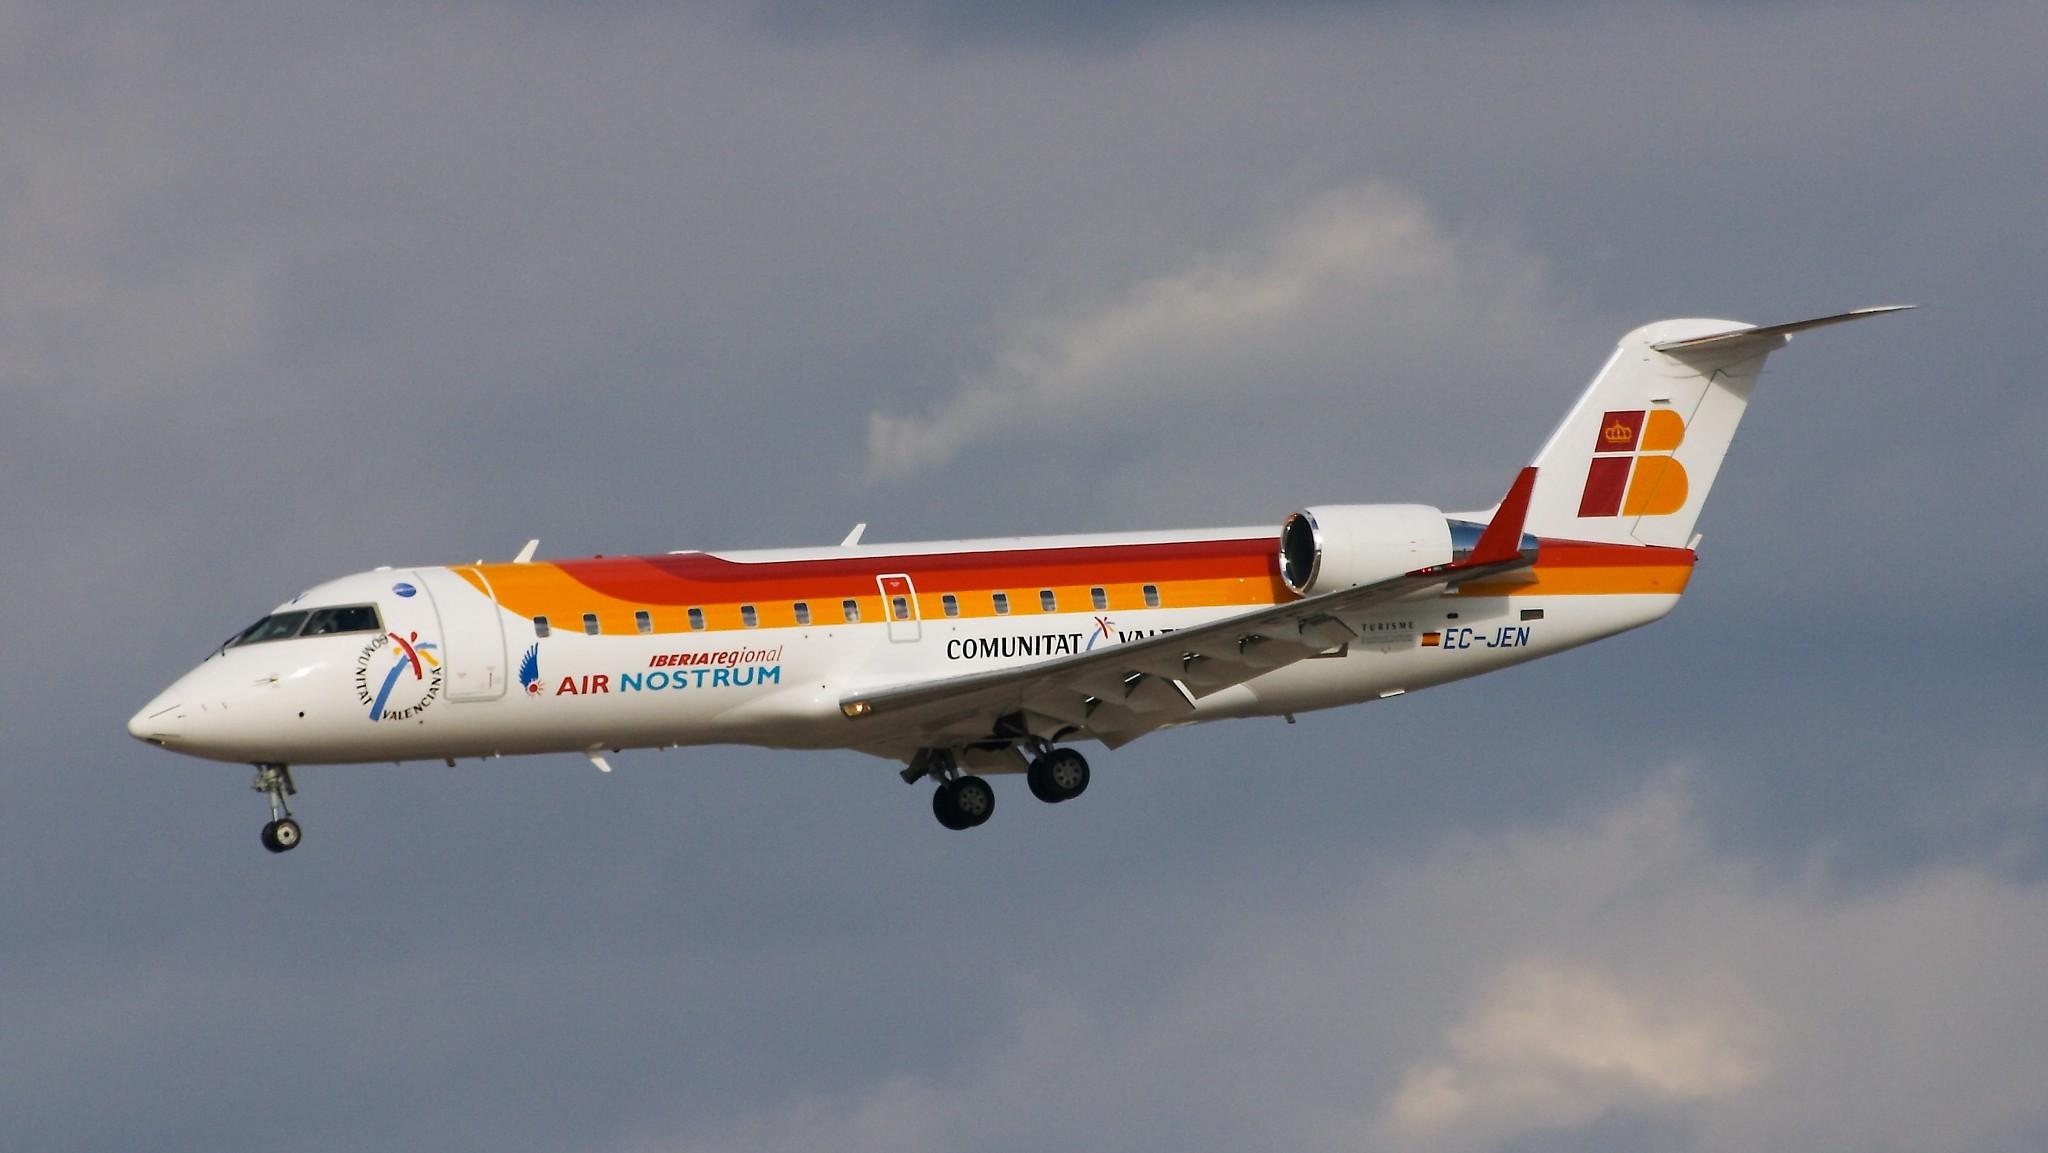 File:canadair cl-600-2b19 regional jet crj-200er - air nostrum (iberia